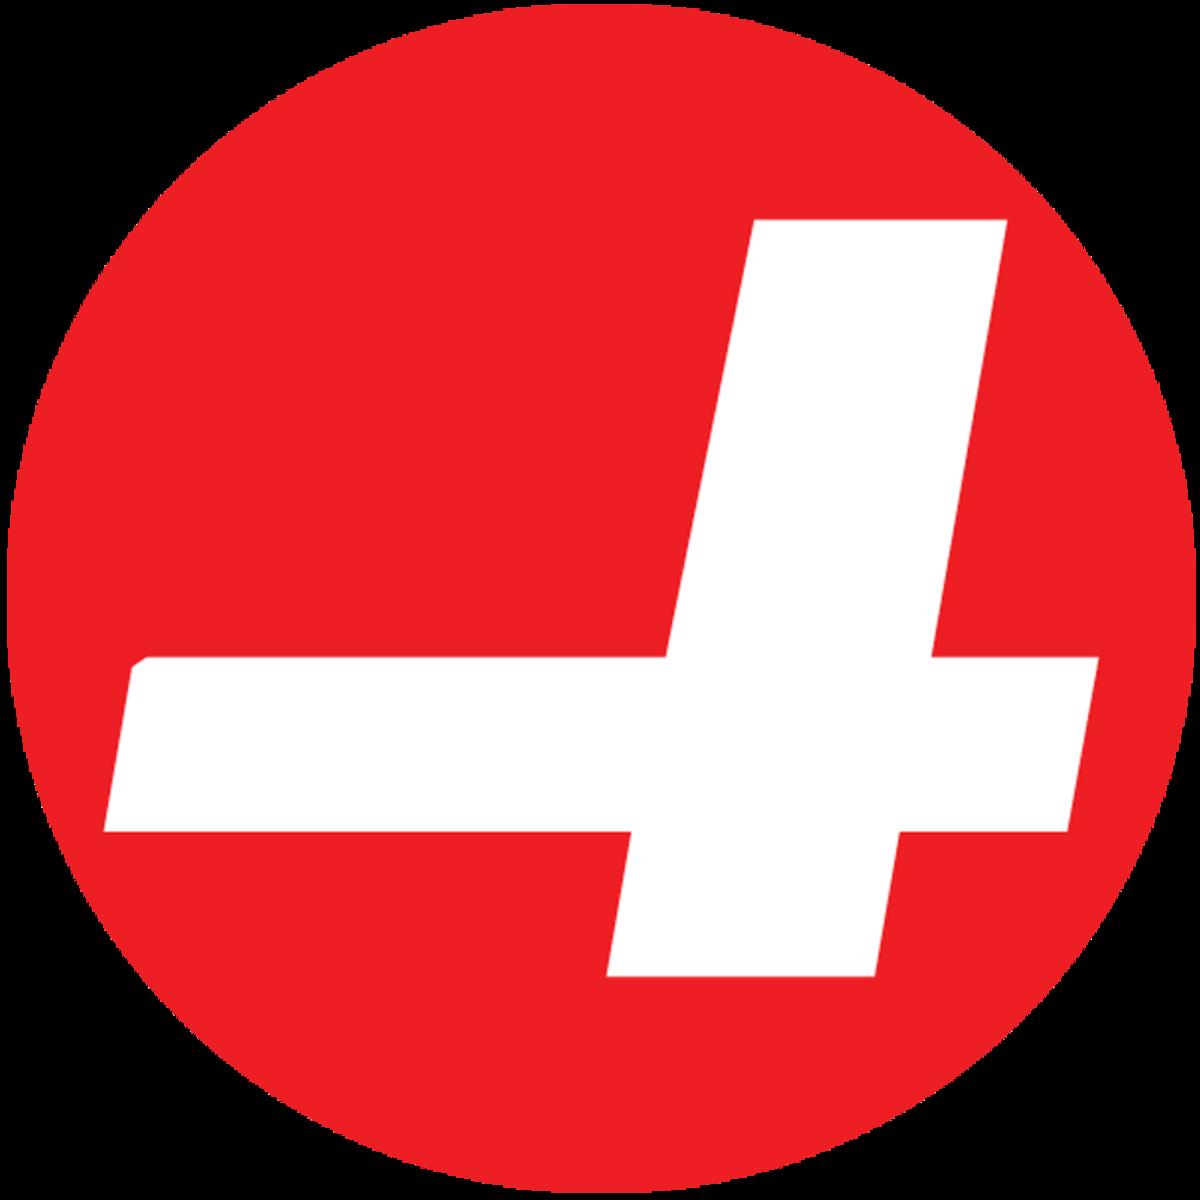 https://s.starladder.com/uploads/team_logo/4/d/c/8/meta_tag_b05a8f418c067c0b4d0e79ba0de10c08.png логотип